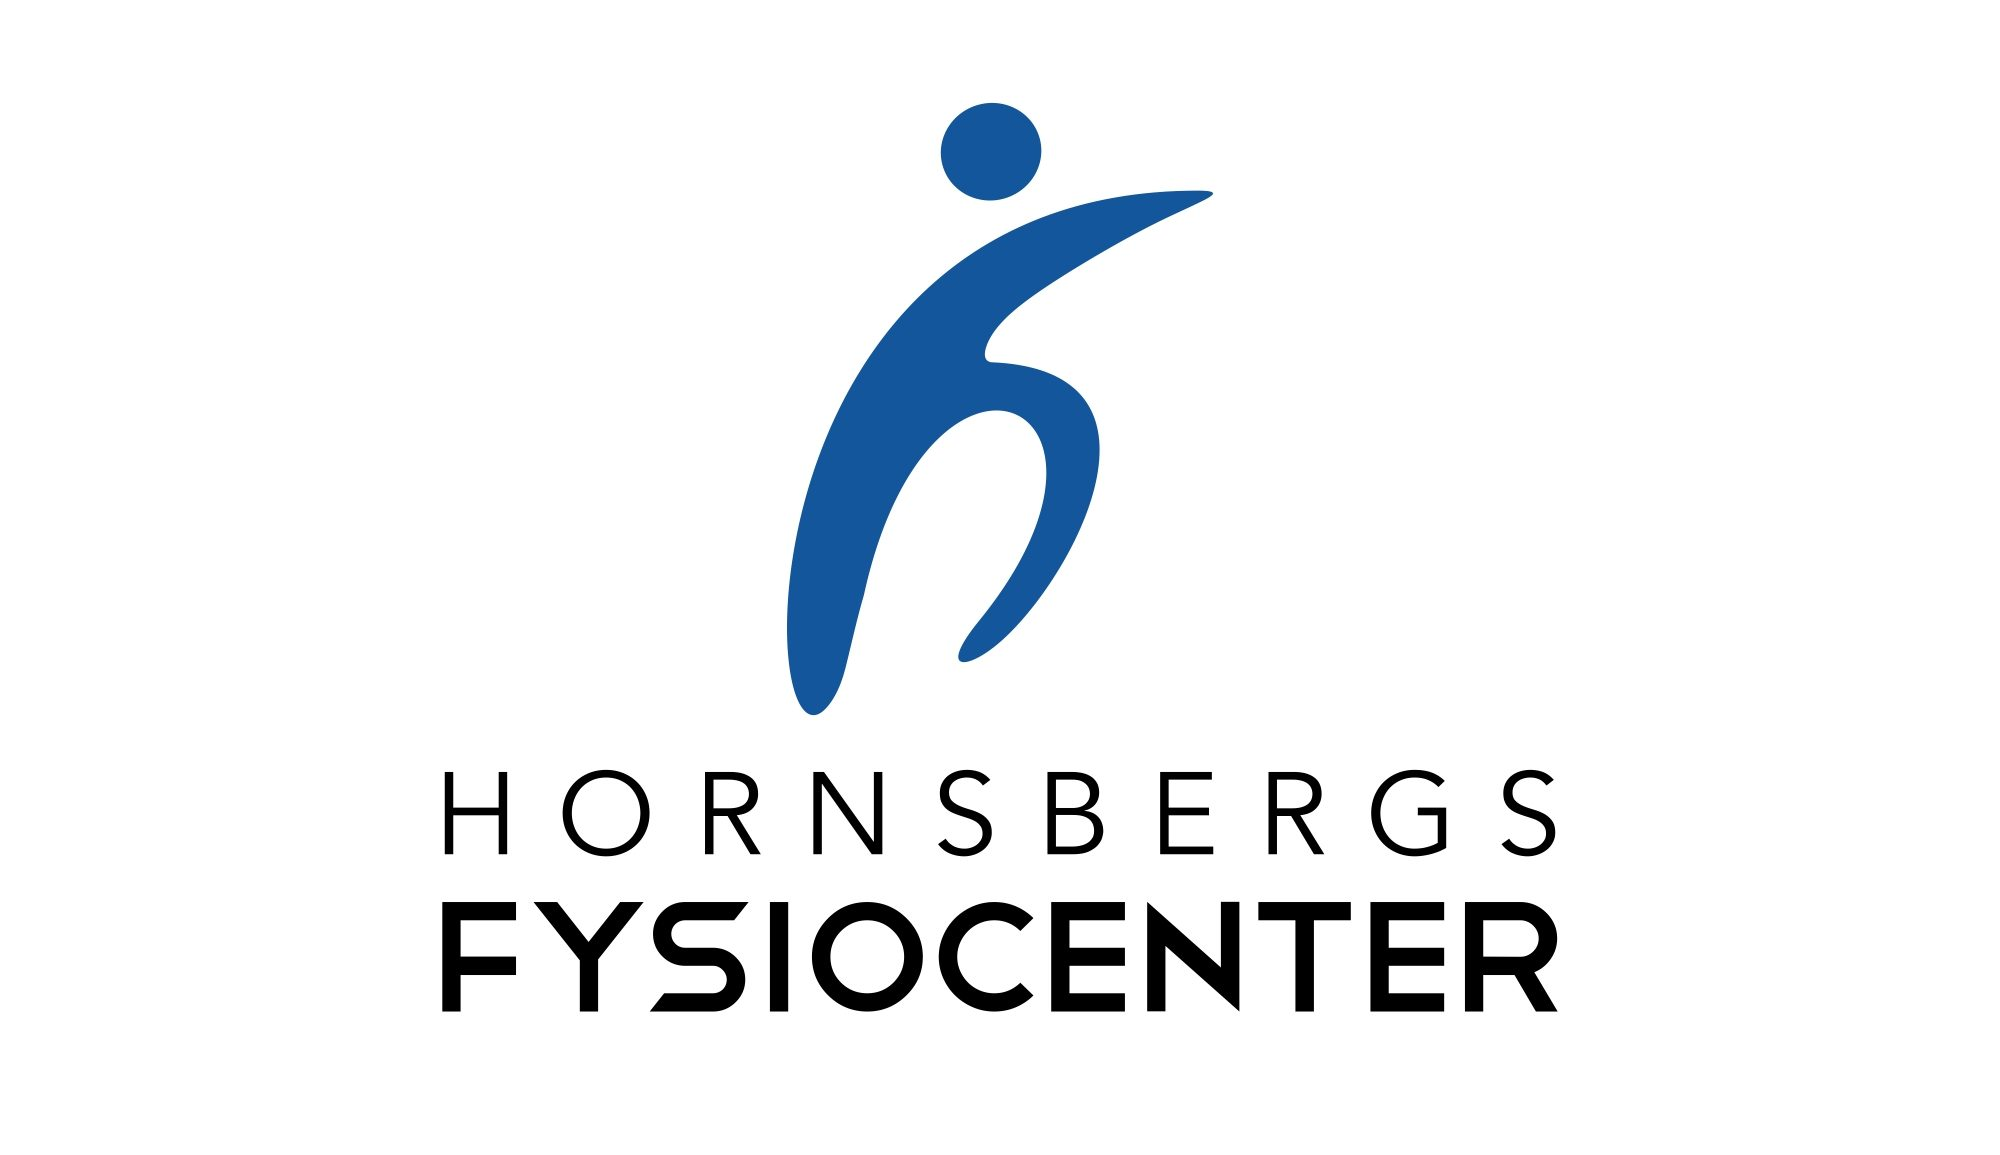 Hornsbergs Fysiocenter